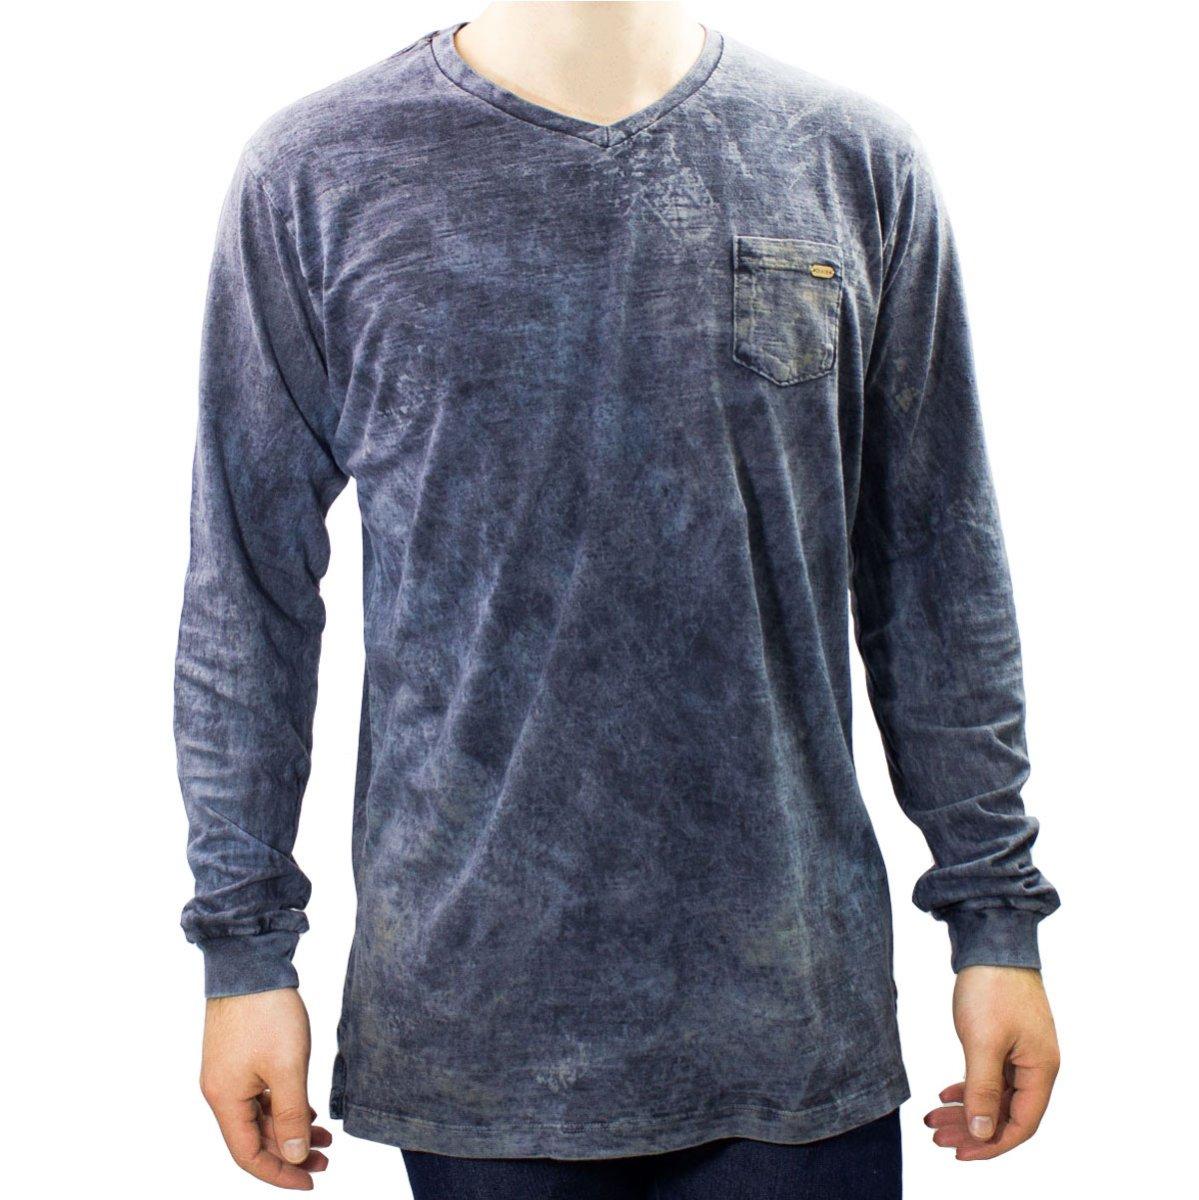 Camiseta Masculina Gola V Dixie 11 23 0001